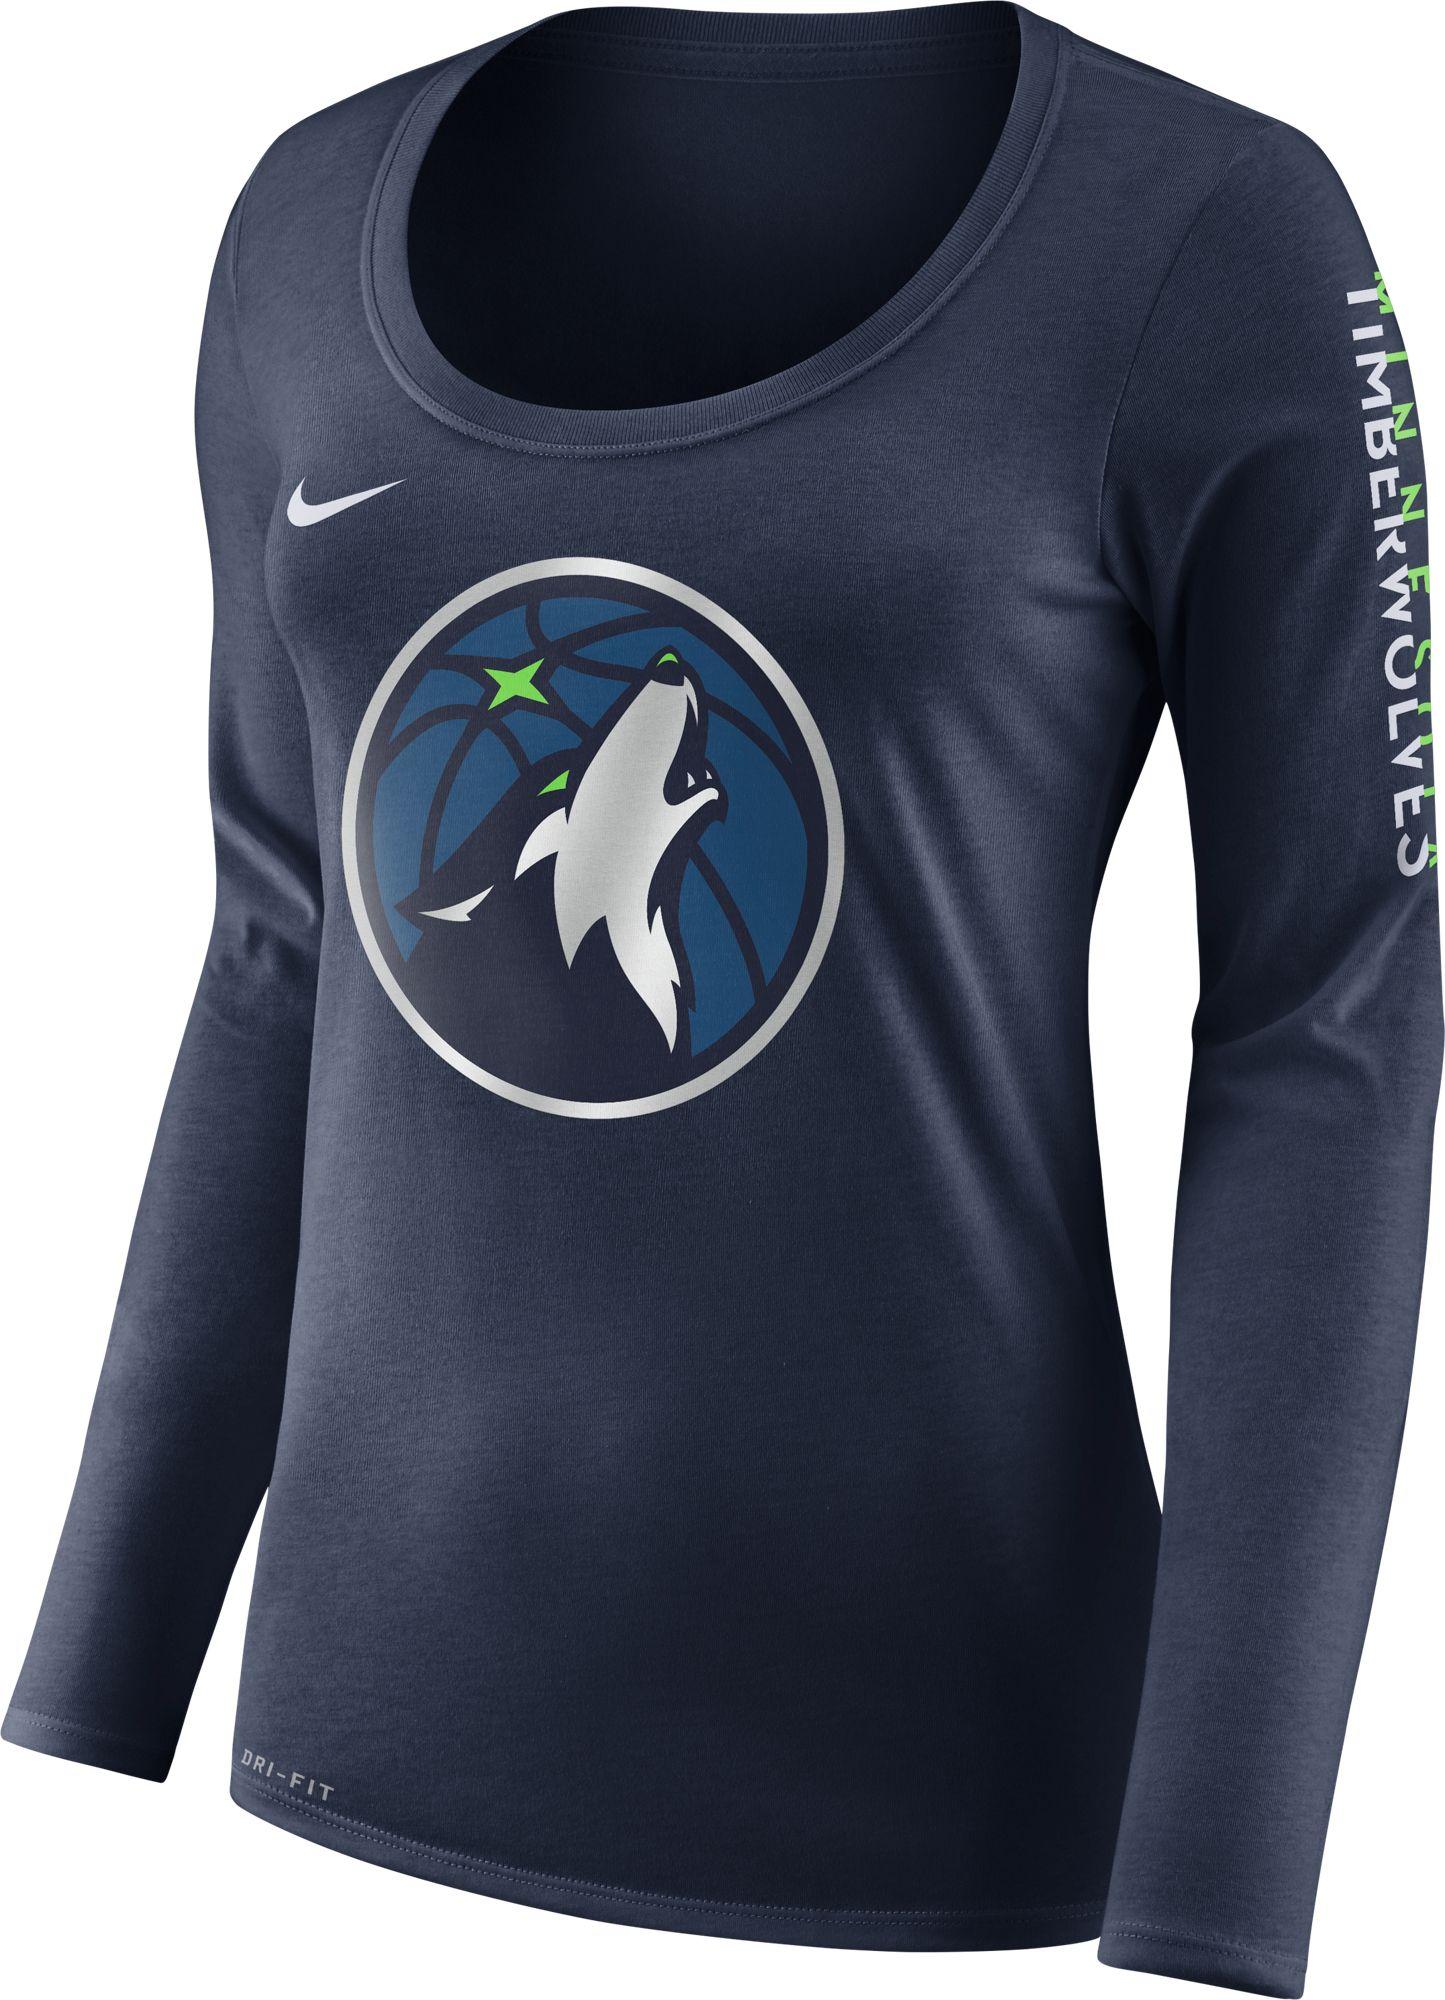 e9d57f08 Dri Fit Long Sleeve Shirts Women   RLDM